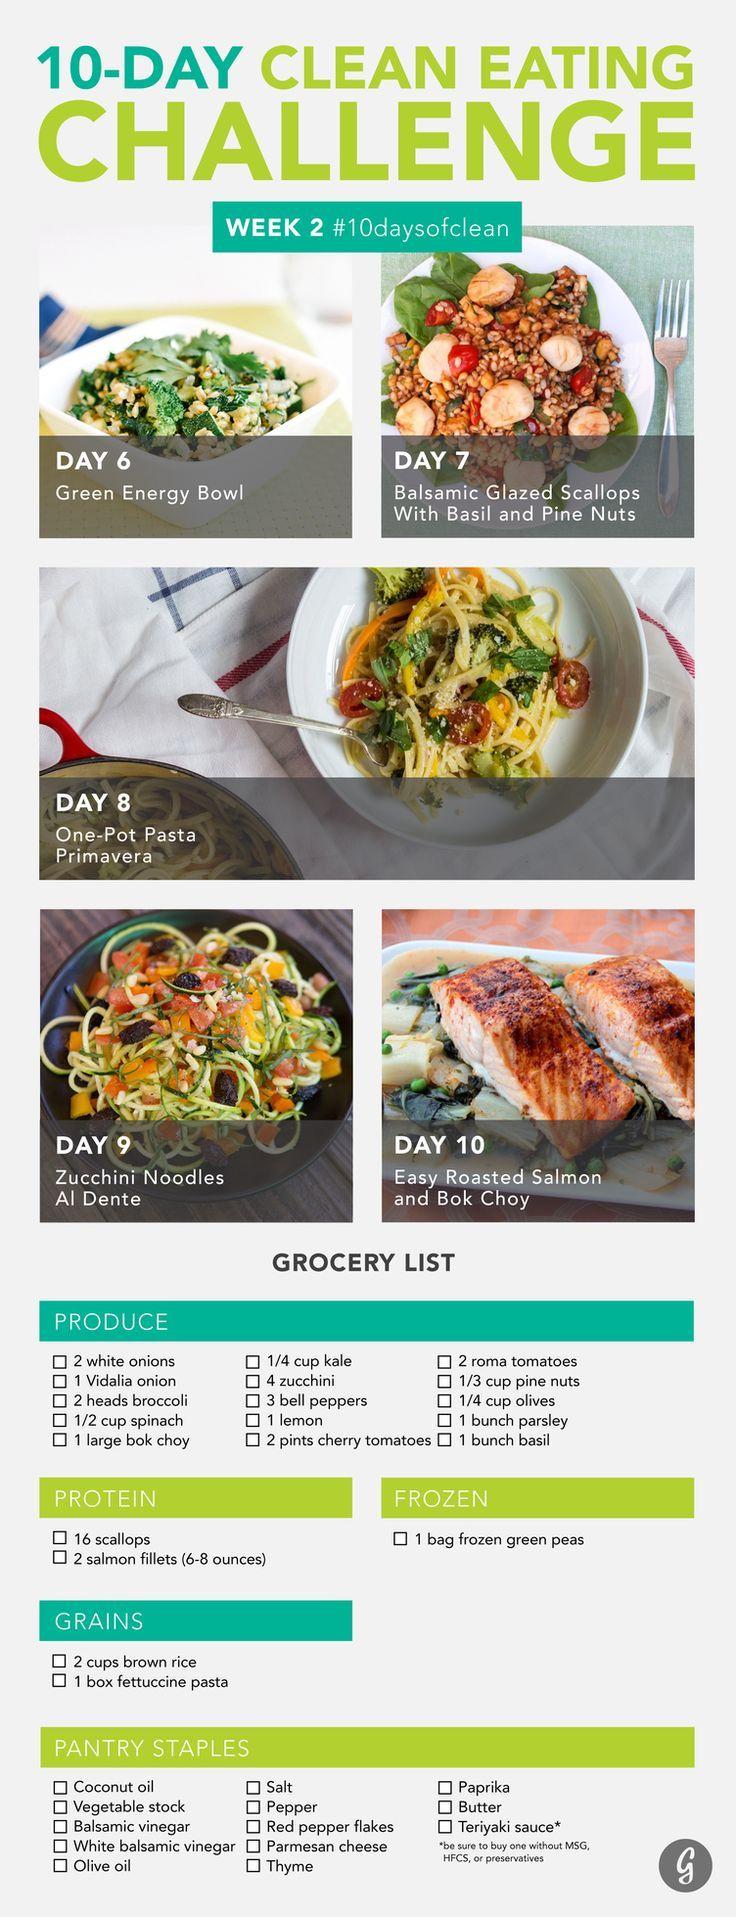 Clean Eating Challenge Week 2 #10daysofclean #healthy #recipes